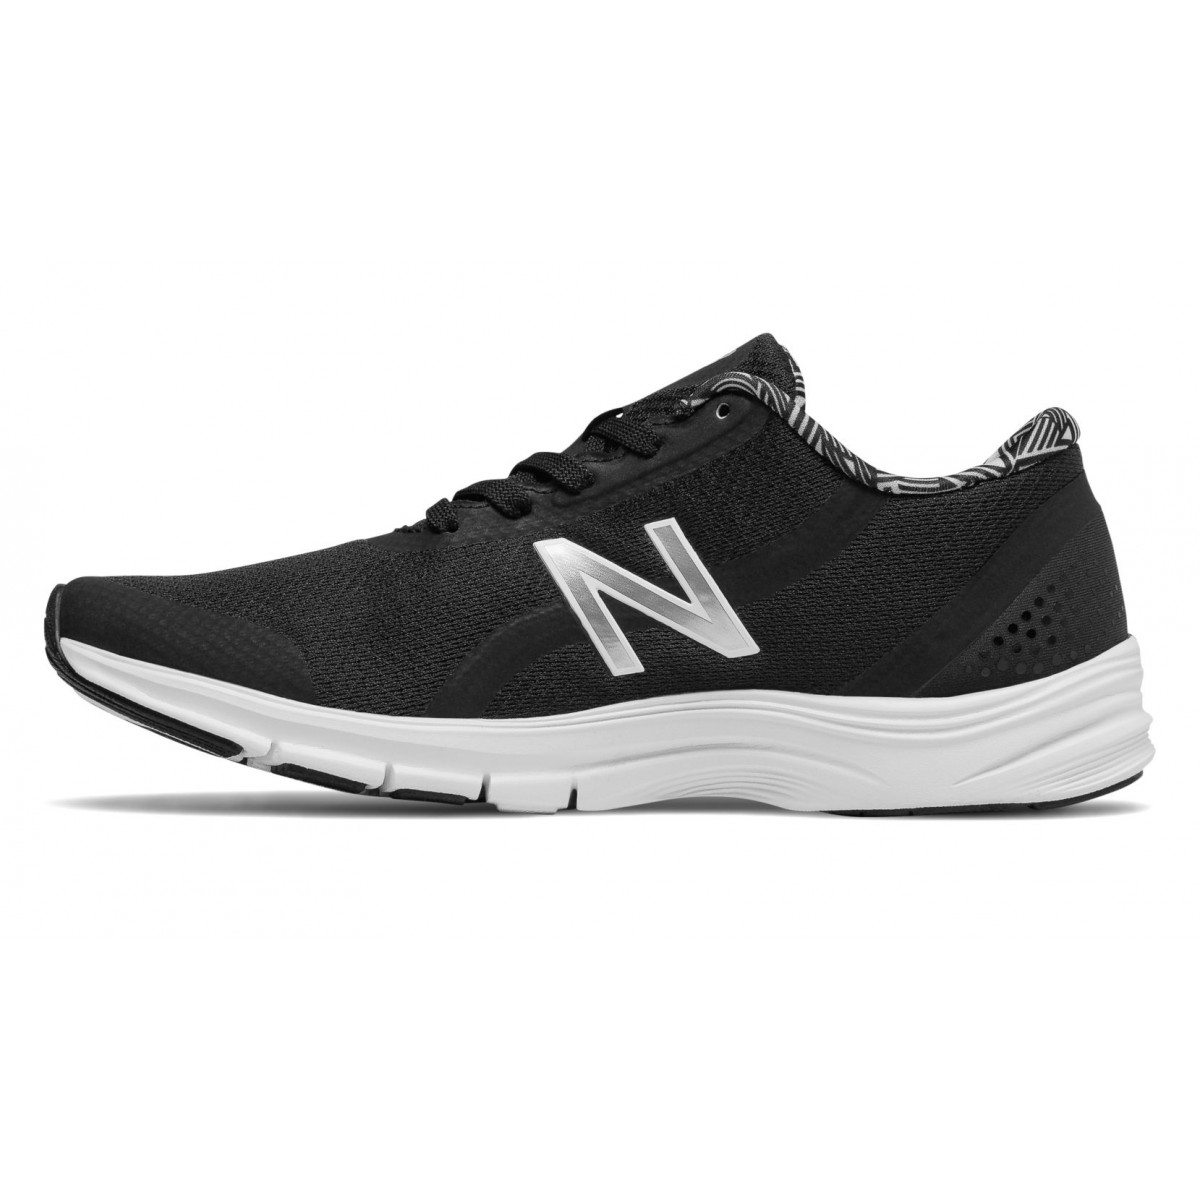 New Balance Zapatillas Mujer Training WX711TG3 Negras T-41 oHEUTDs